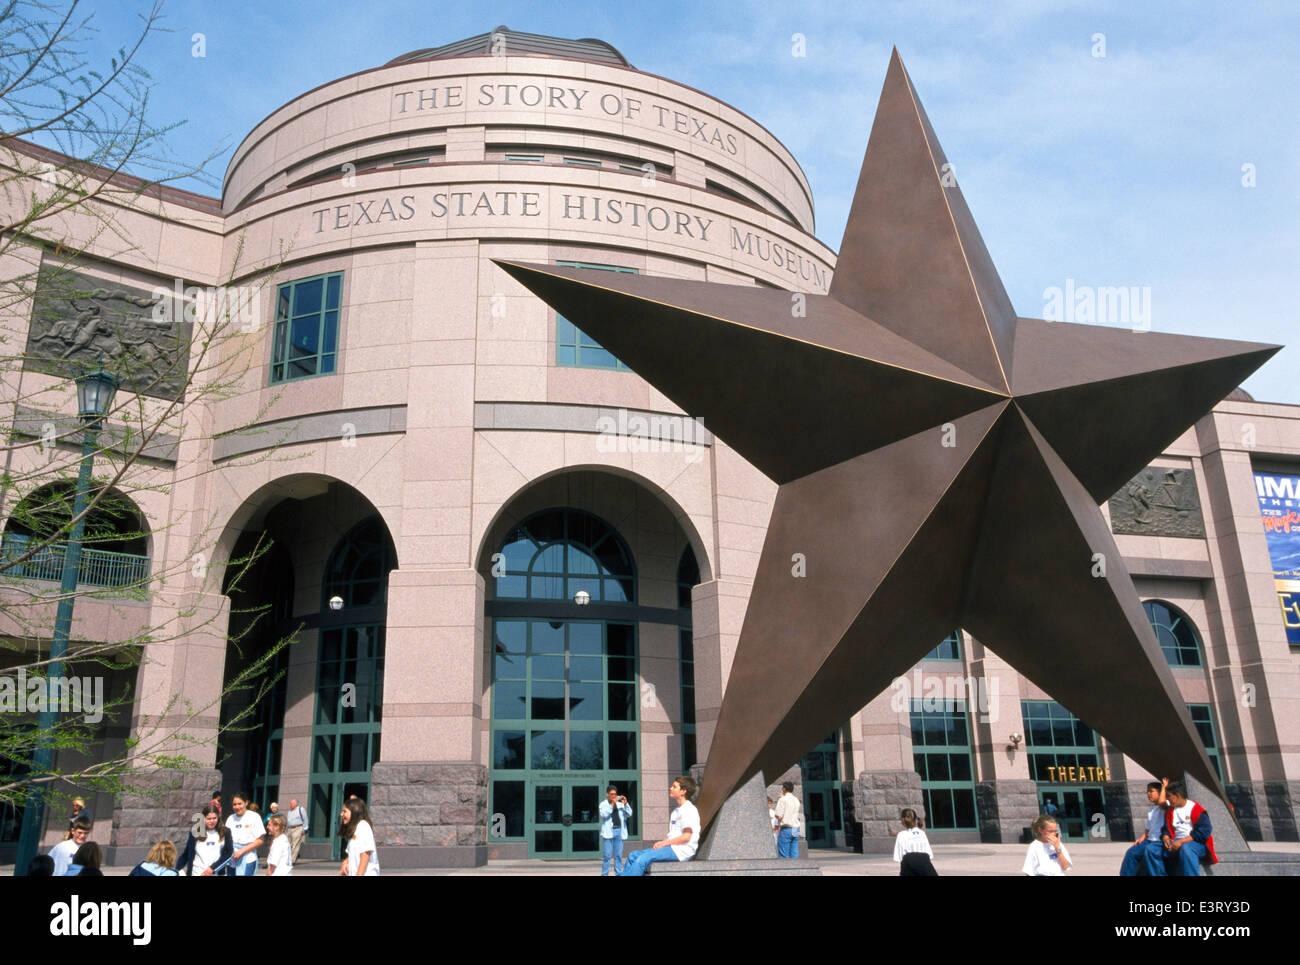 Story Of Texas Stockfotos & Story Of Texas Bilder - Alamy